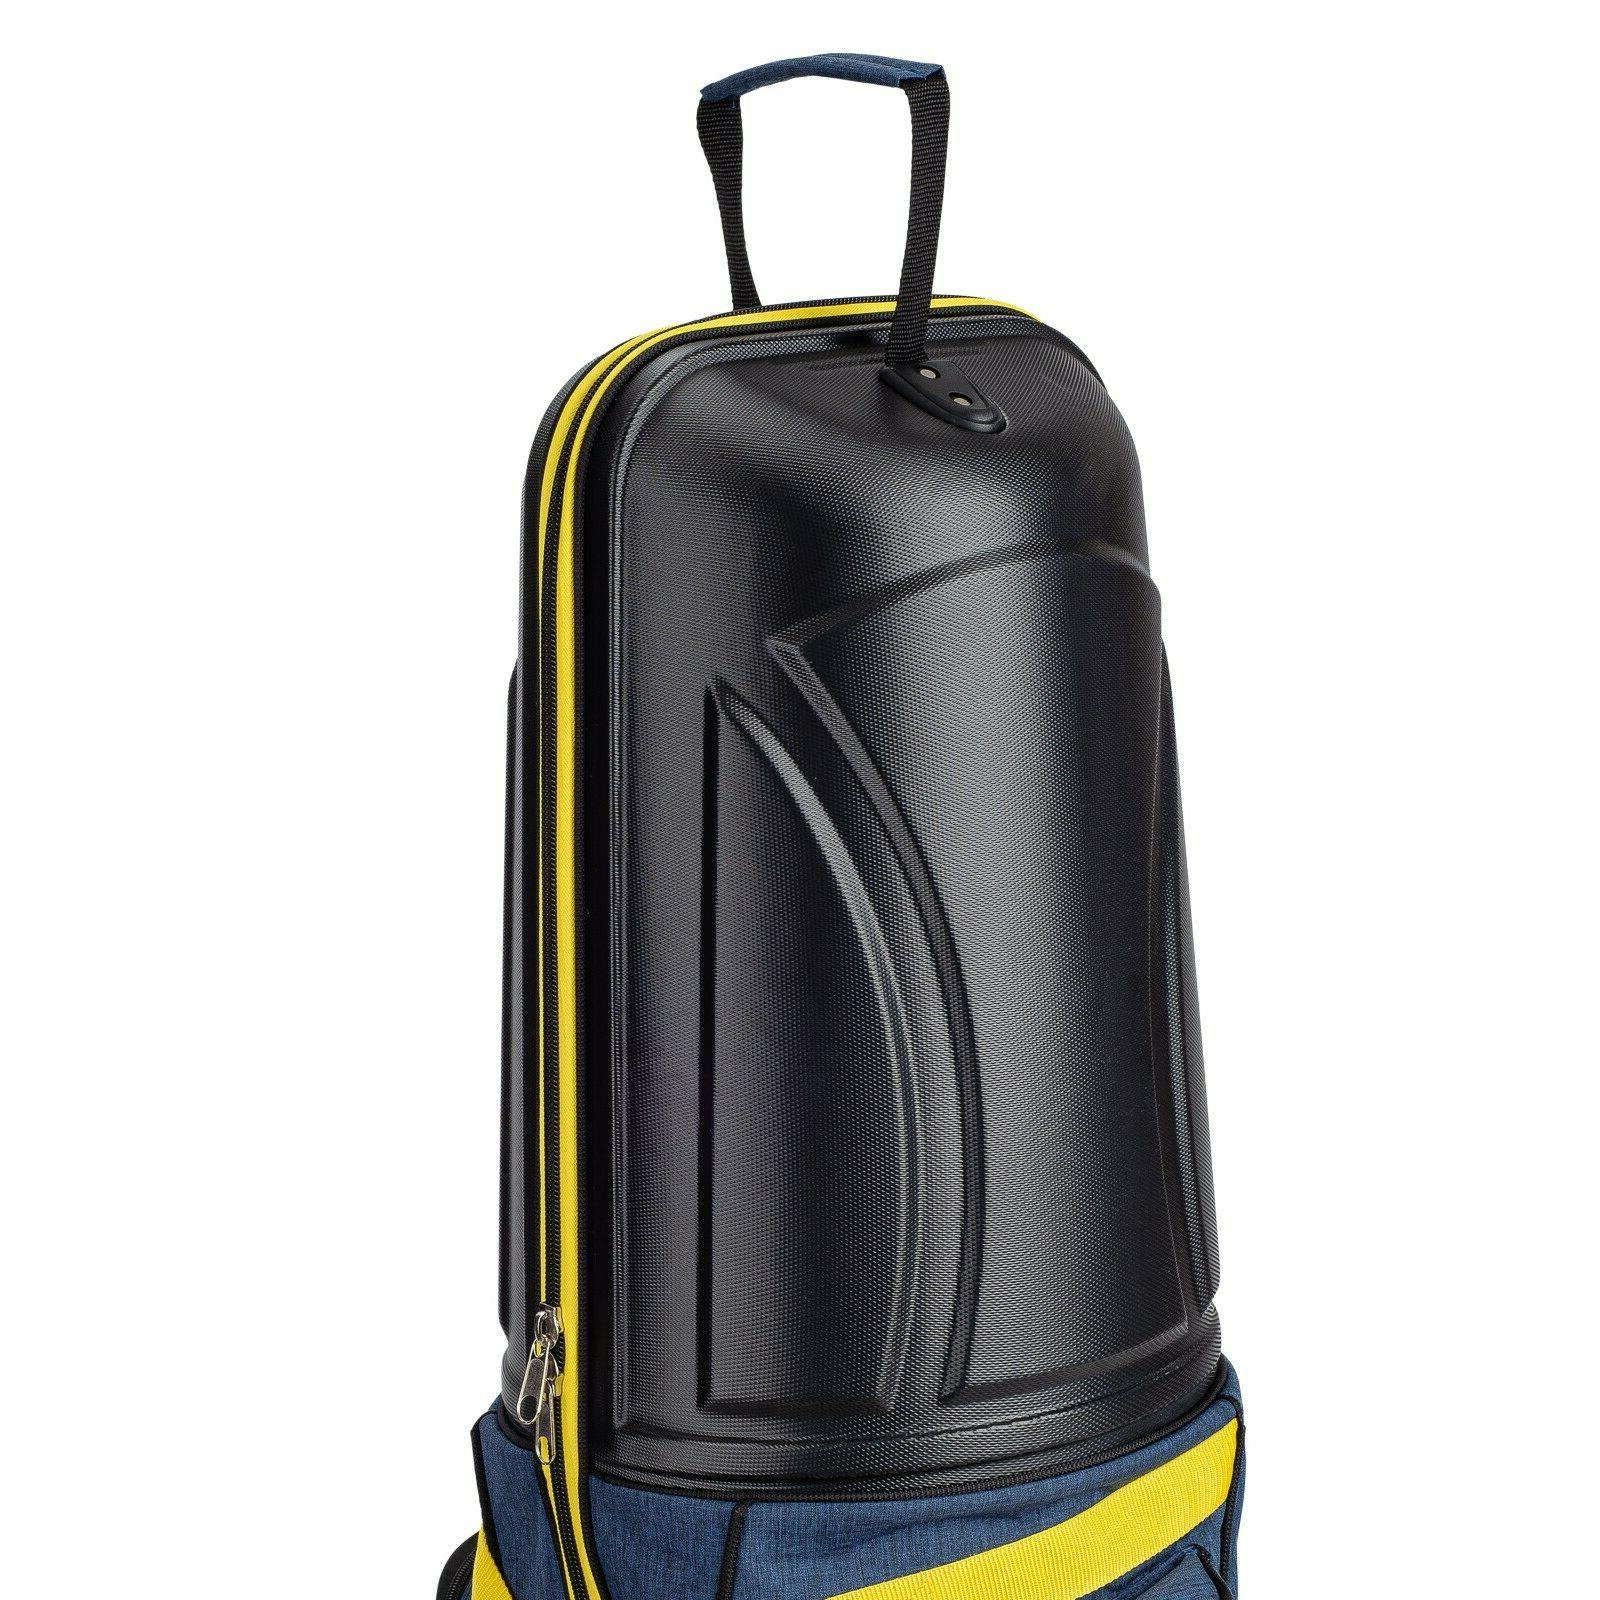 Founders Golf Club Travel Bag Shell